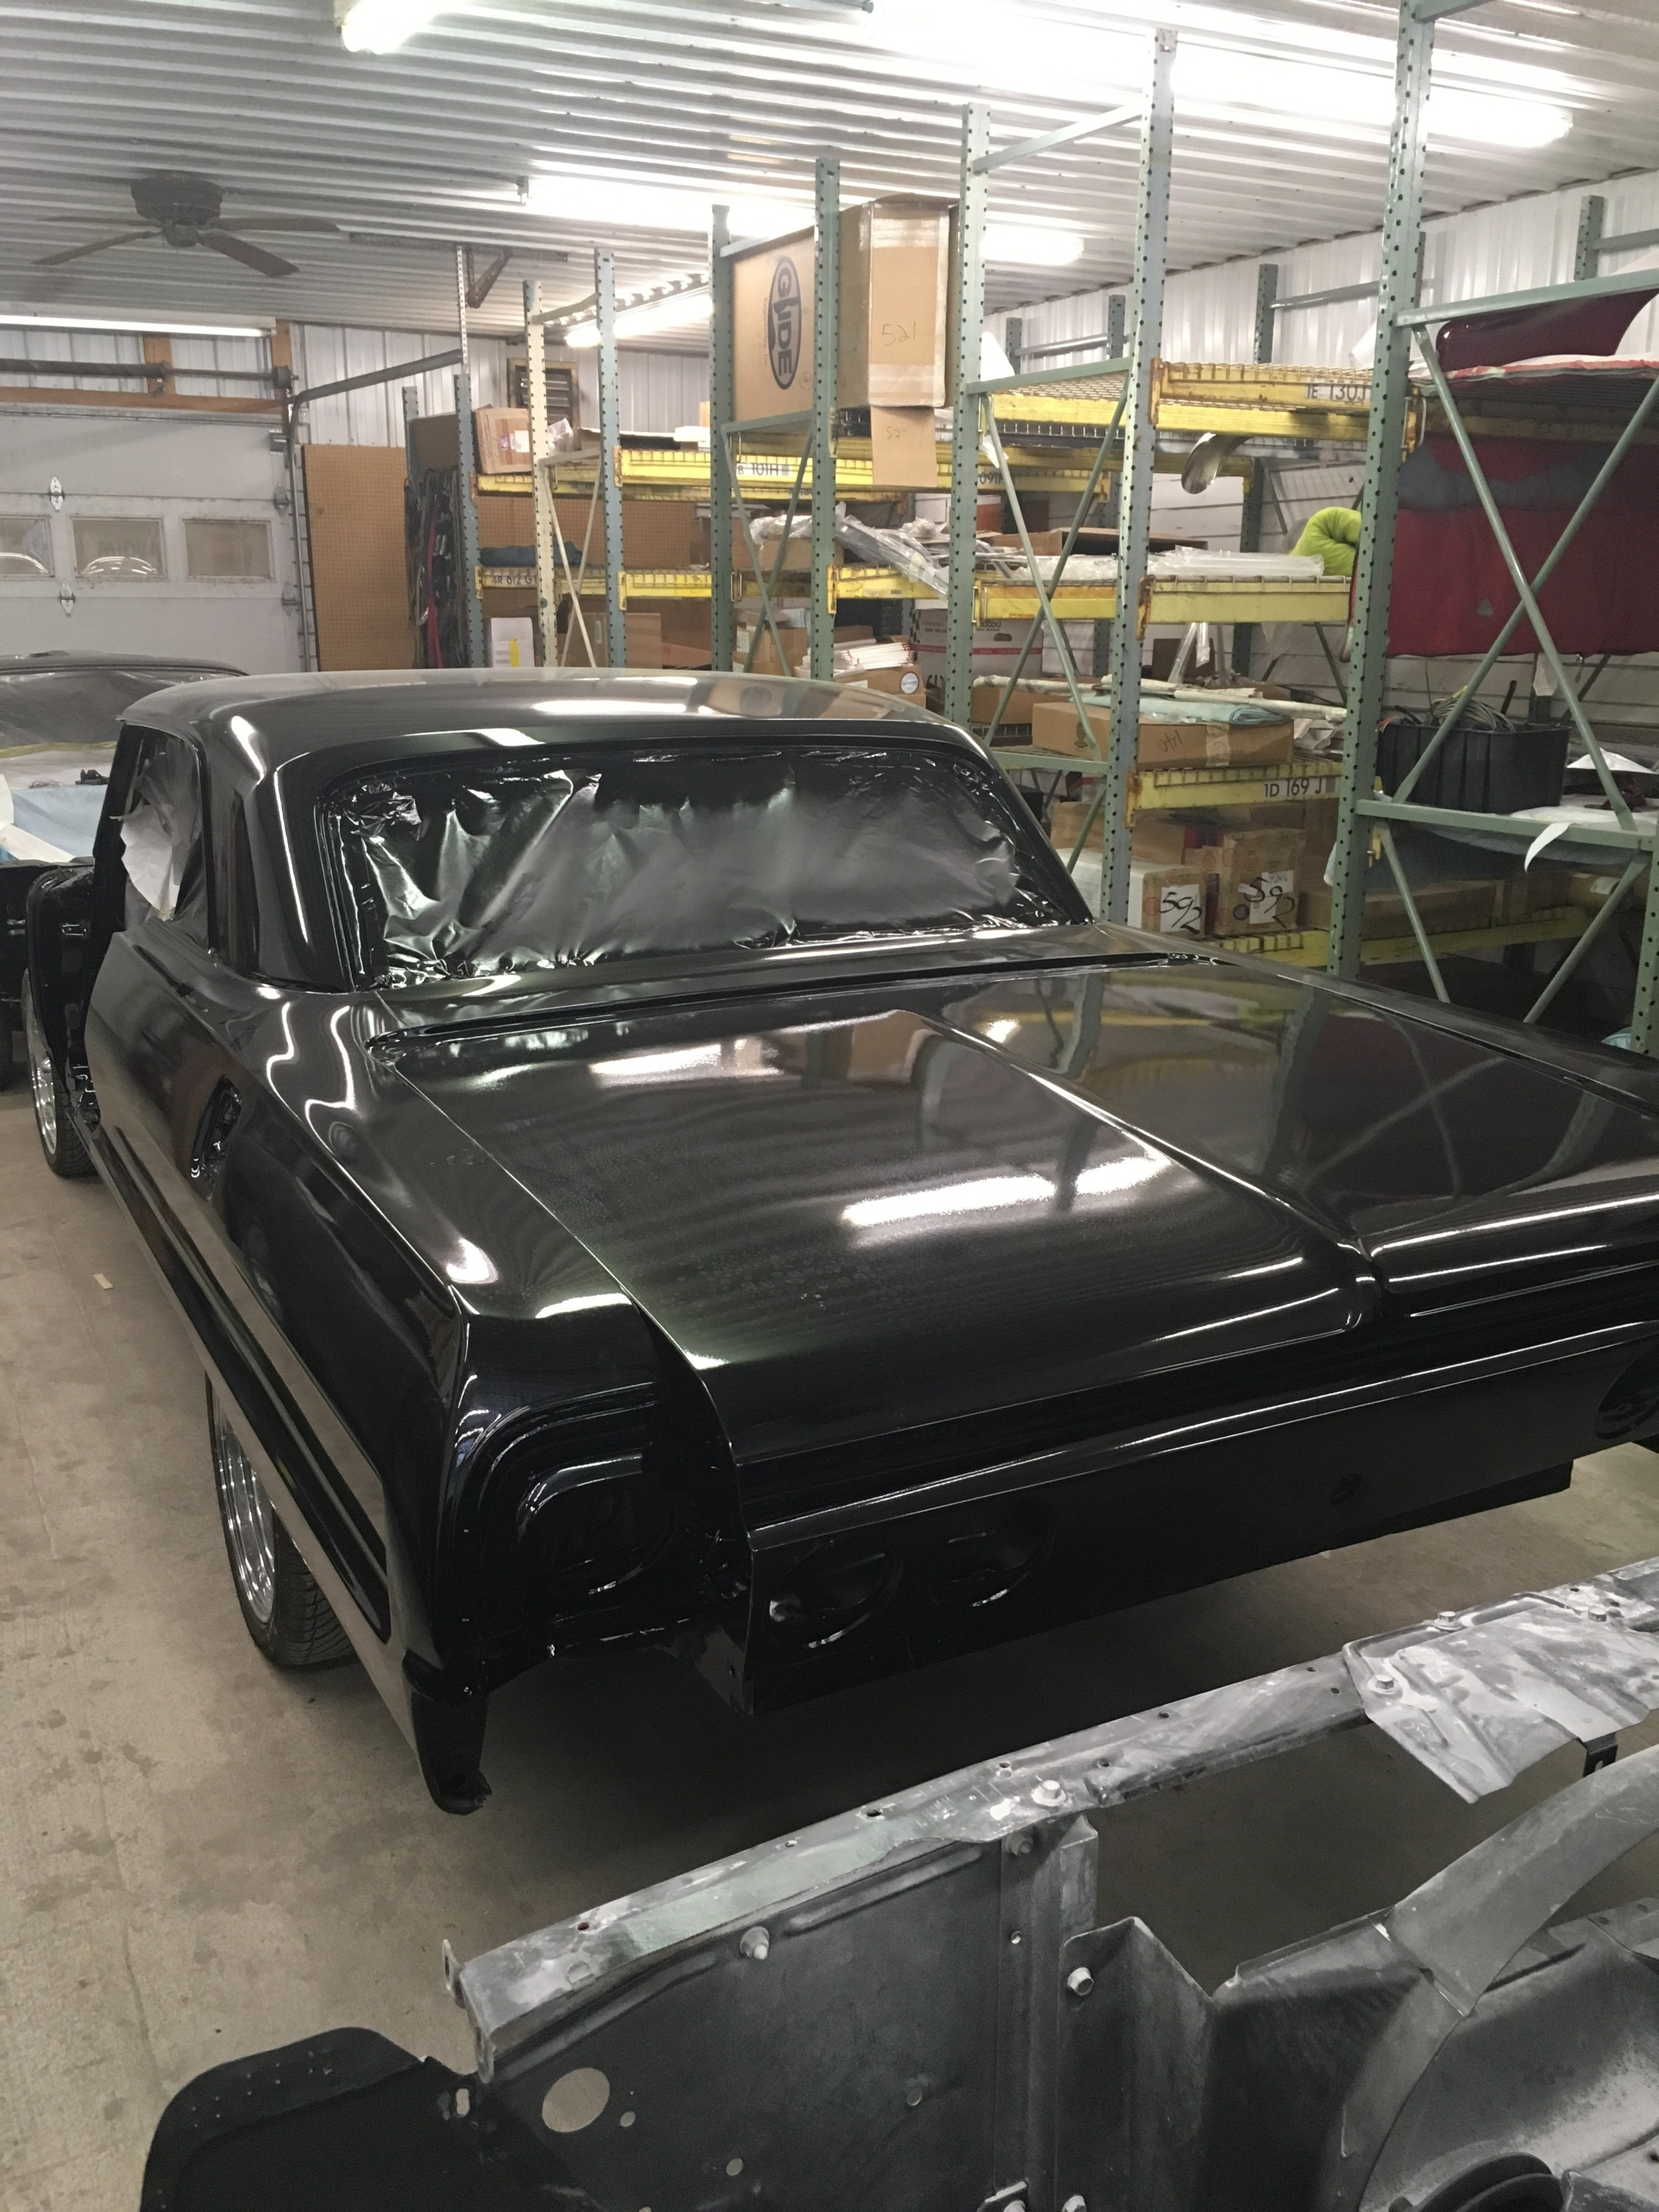 1964 Impala buffed